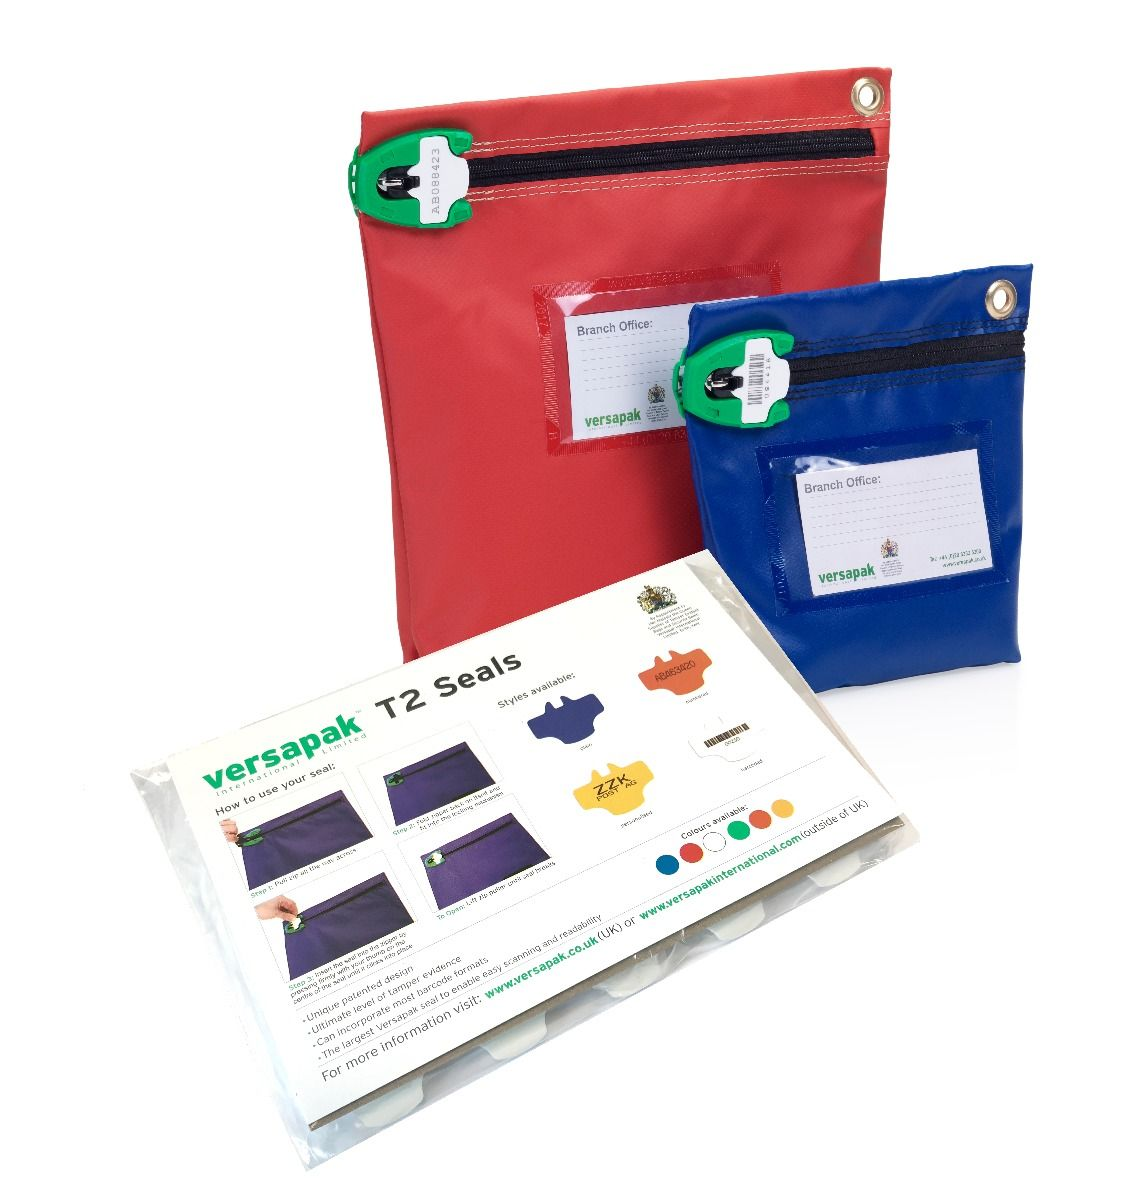 Medium Cash Bag - Security Seals Starter Kit